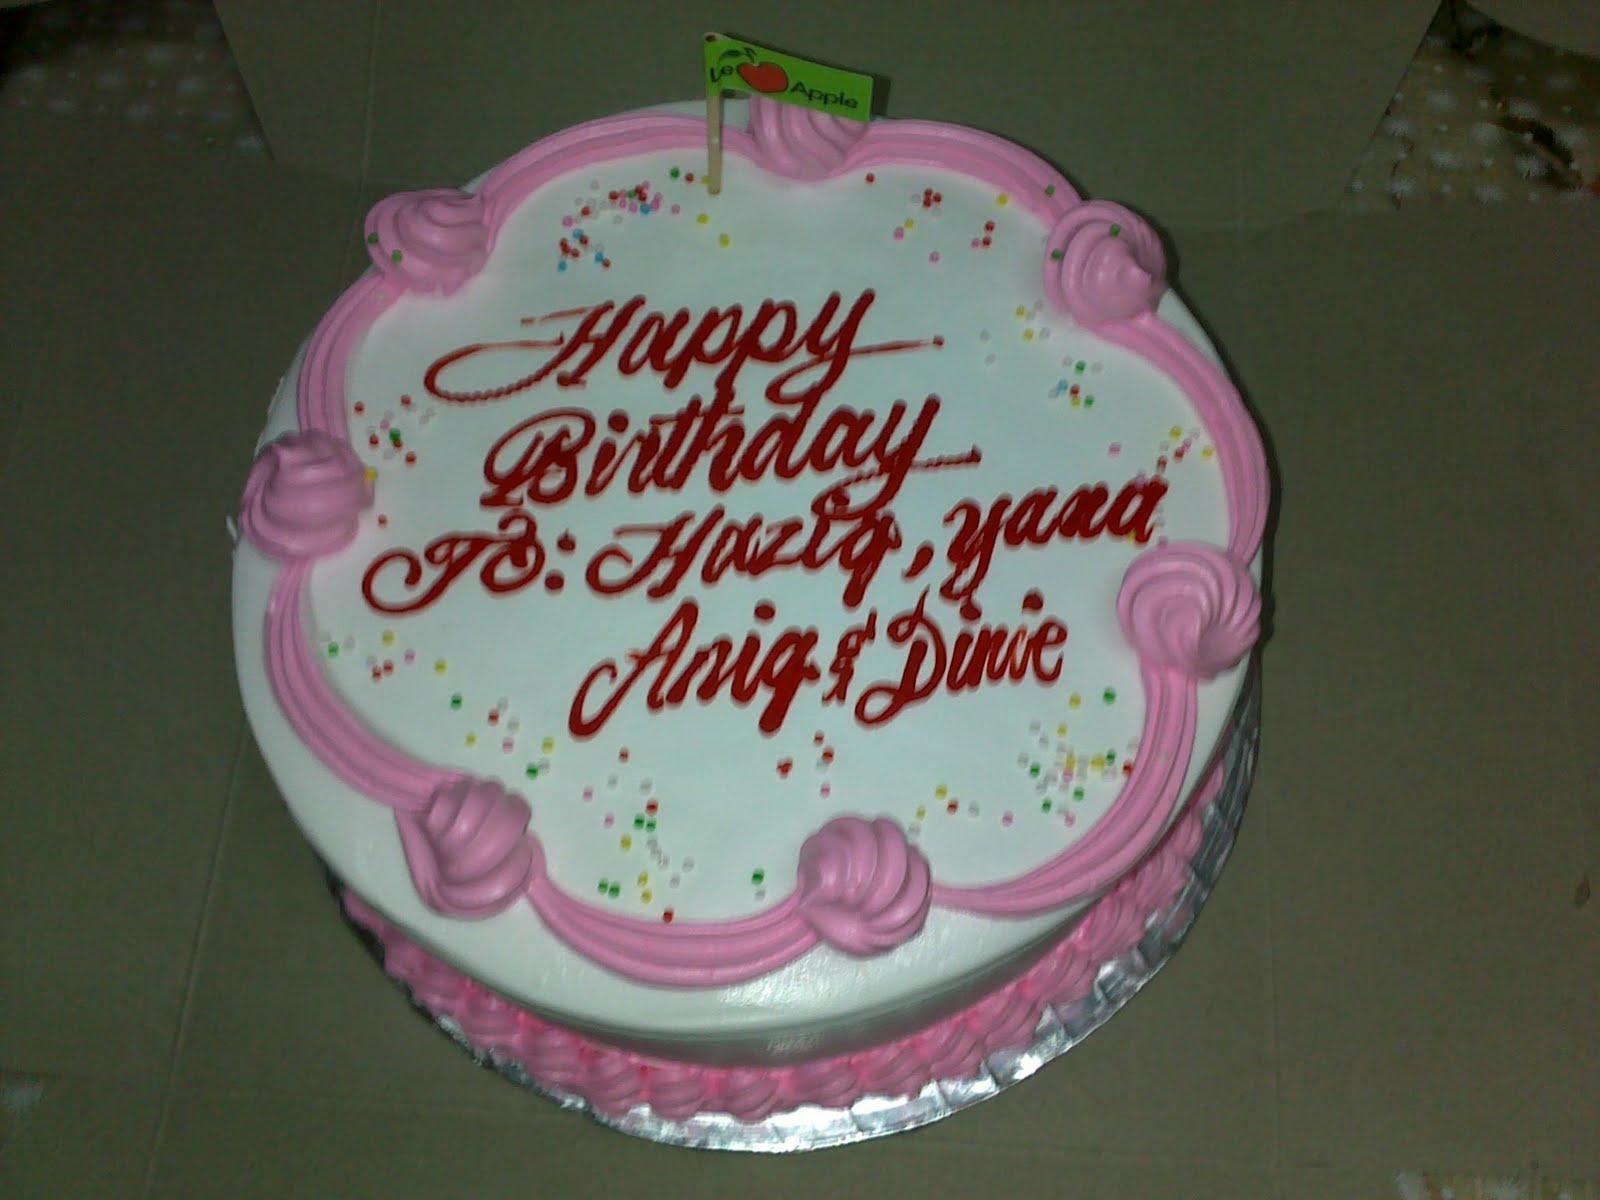 Happy Birthday Hubby Cake Pics